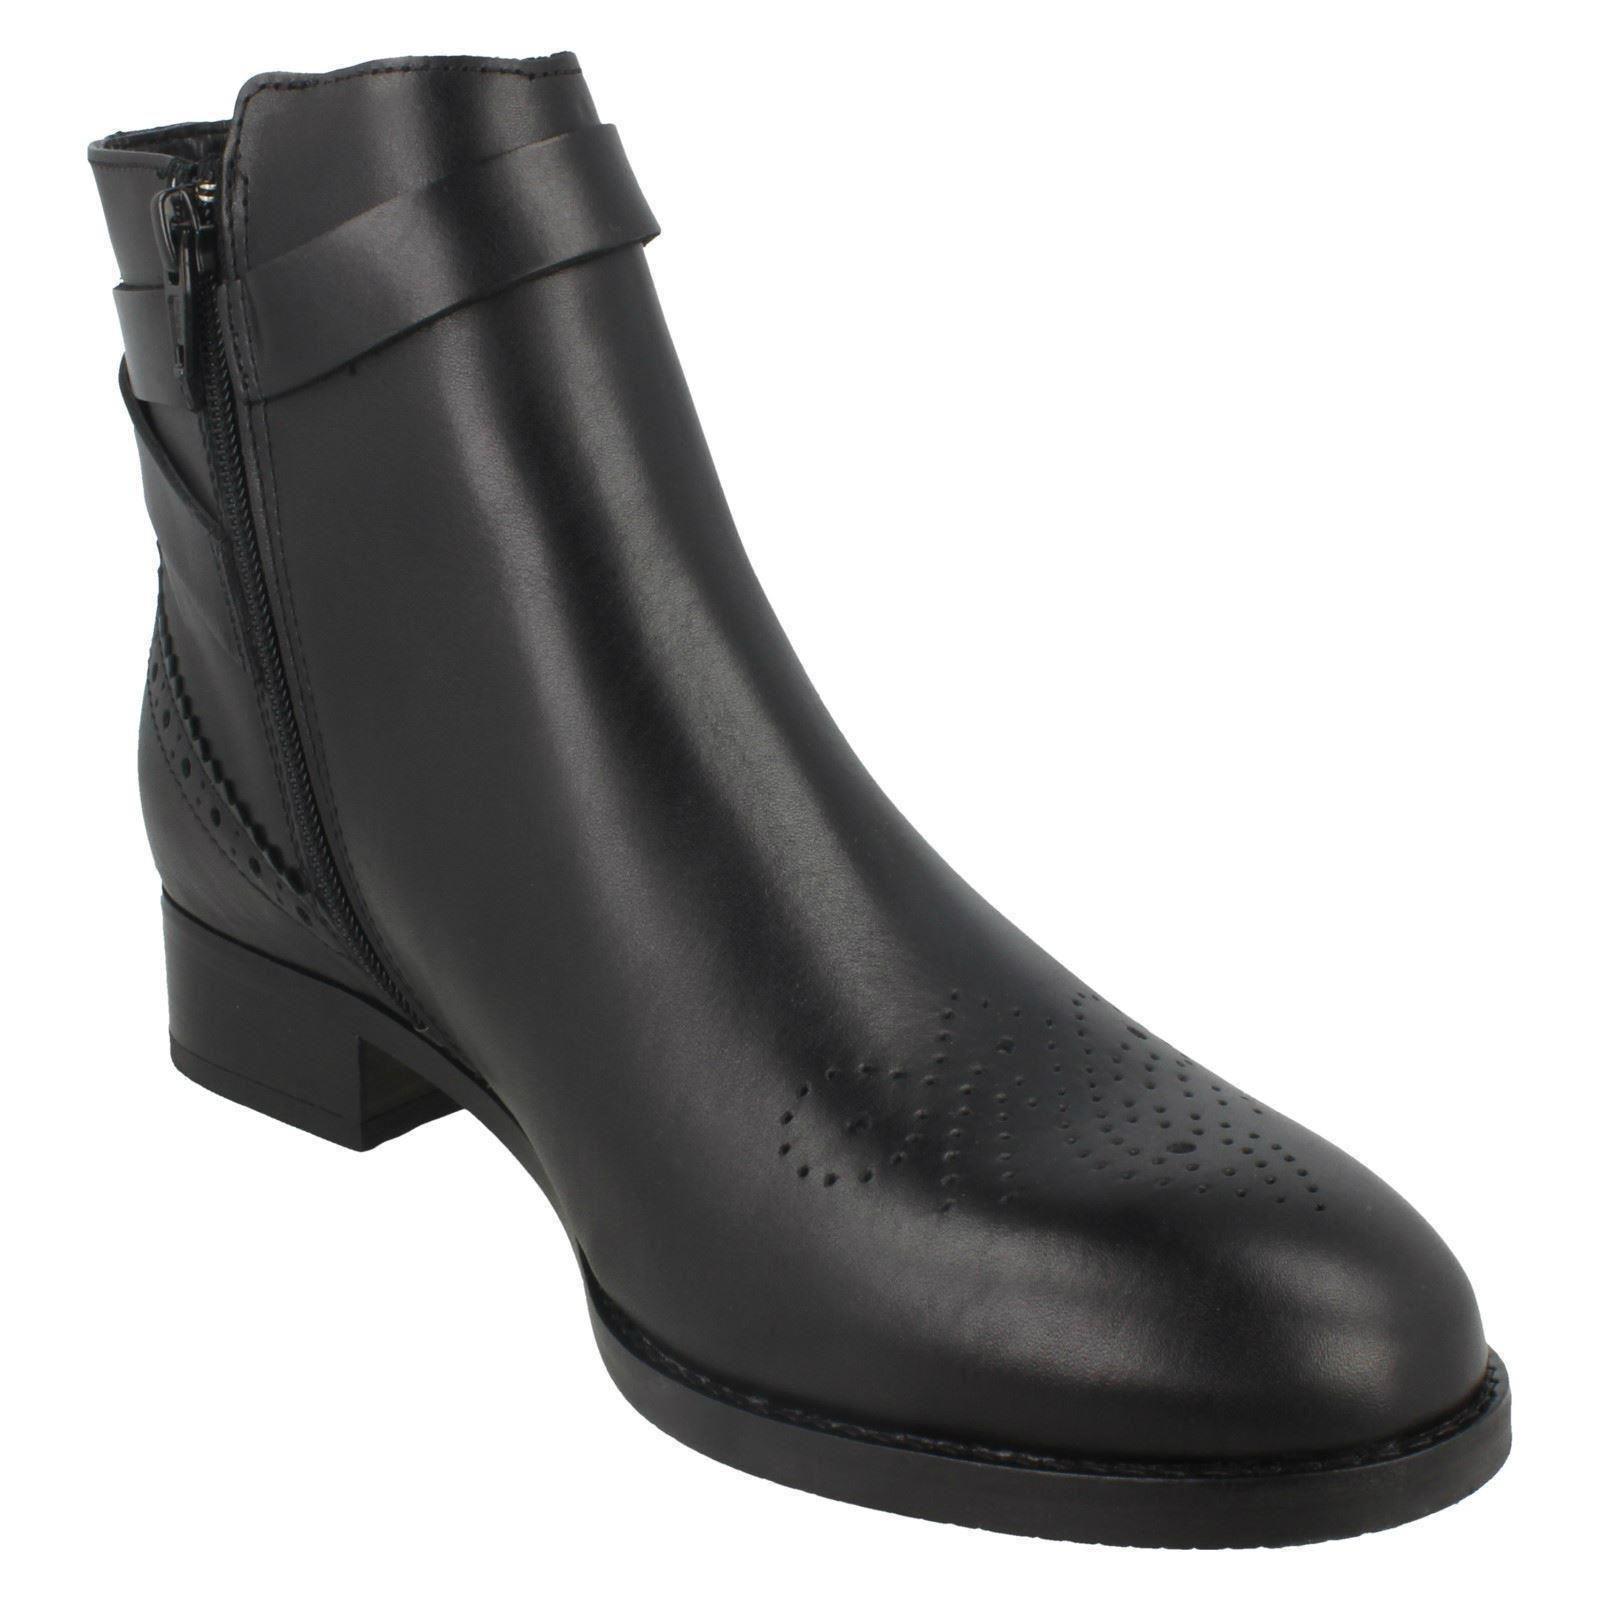 Ladies Clarks Smart Ankle Boots - - - Netley Olivia 928829